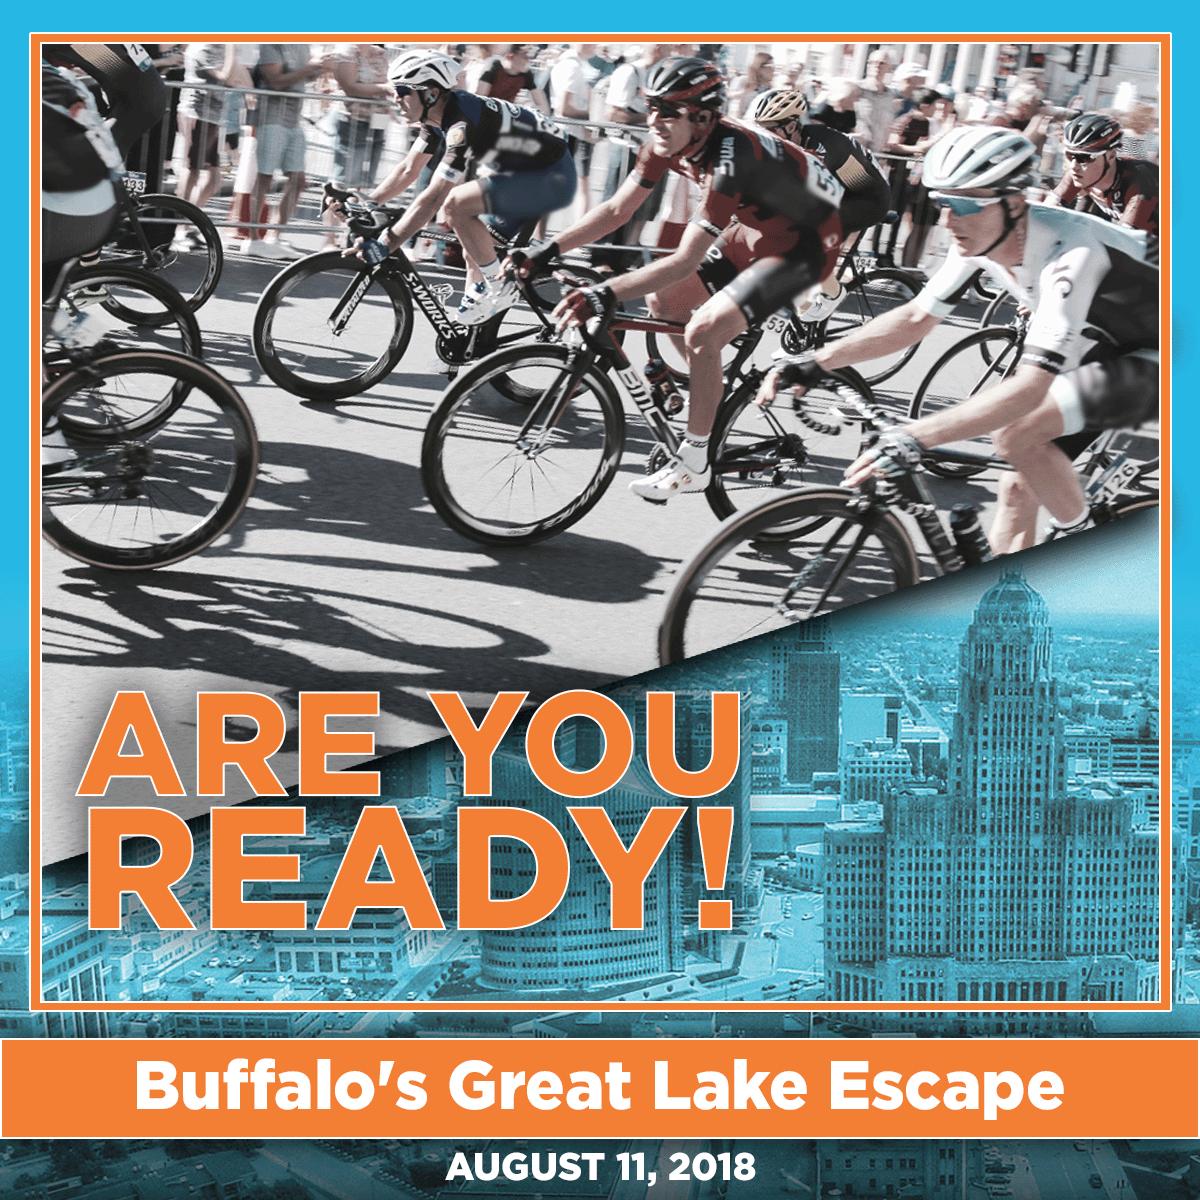 buffalo's great lake escape 2018